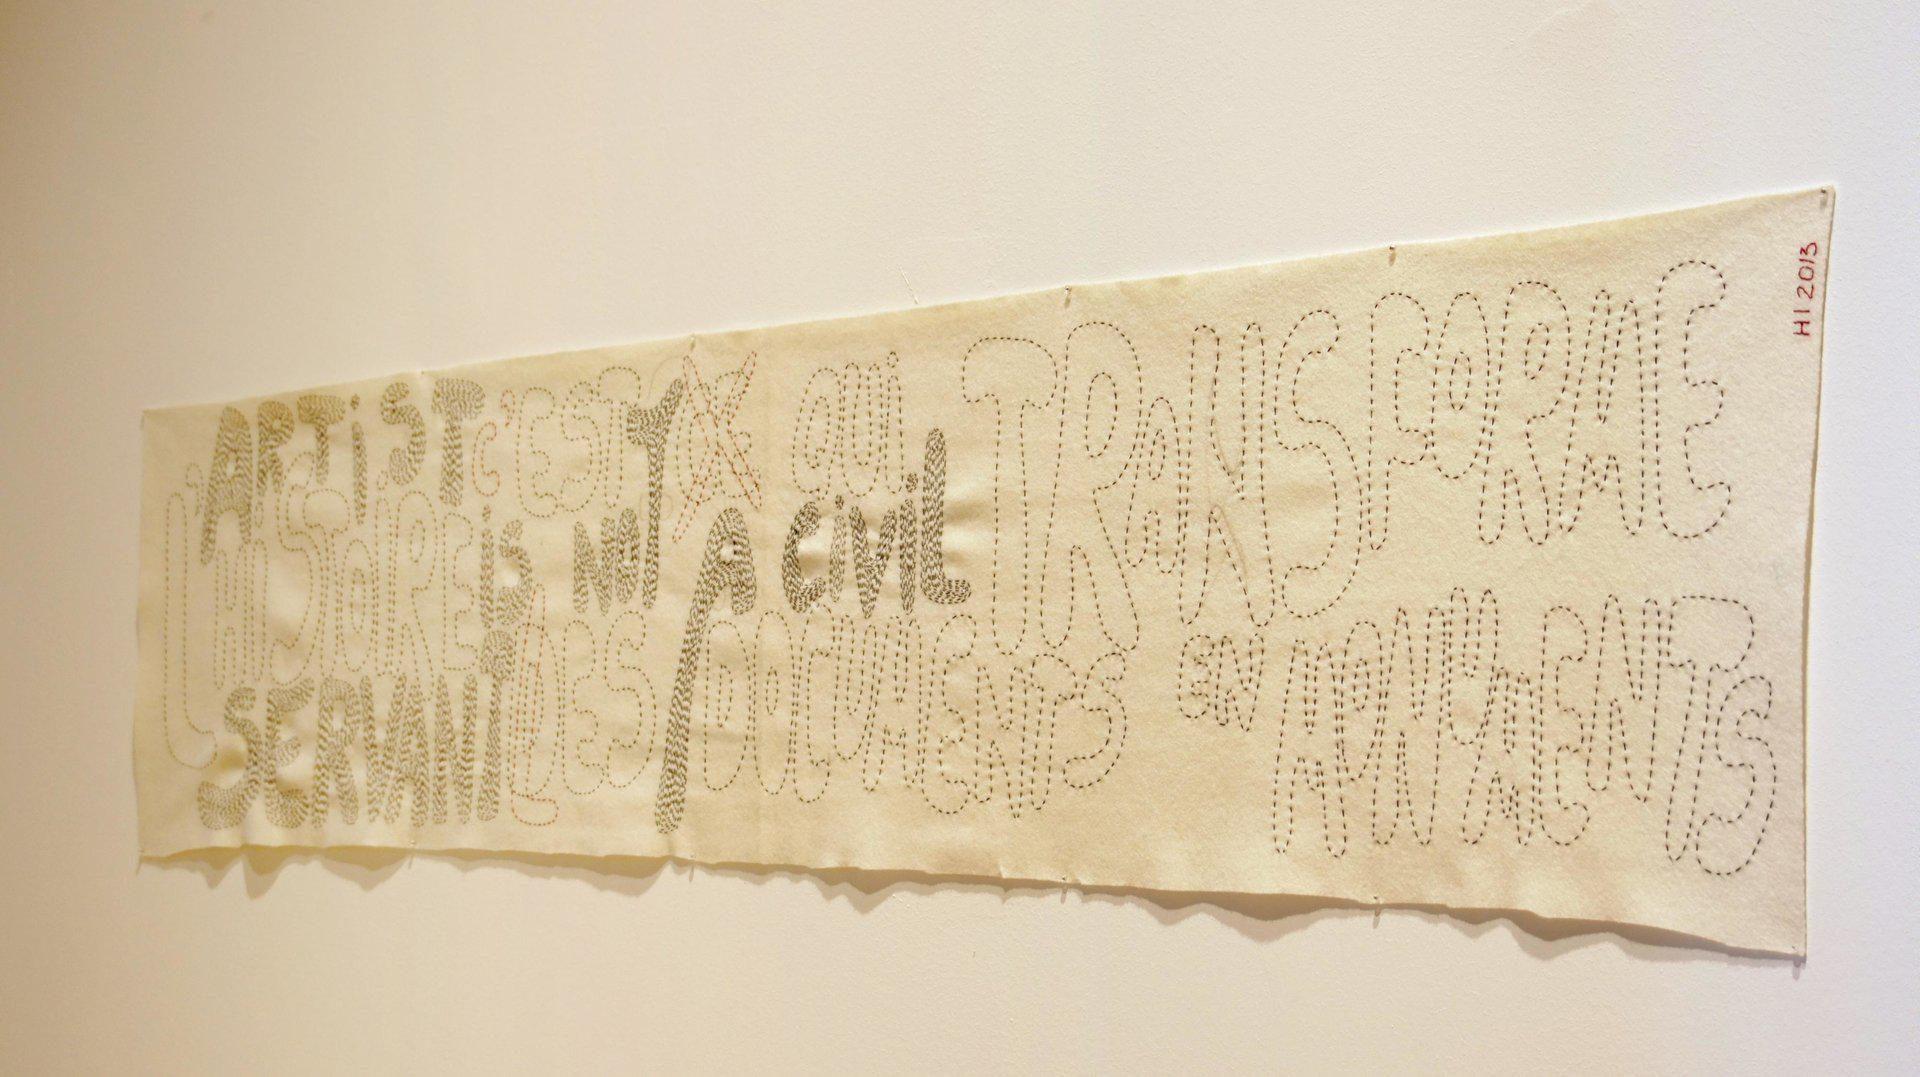 Hristina Ivanoska, Untitled (Artist is Not a Civil Servant), 2013